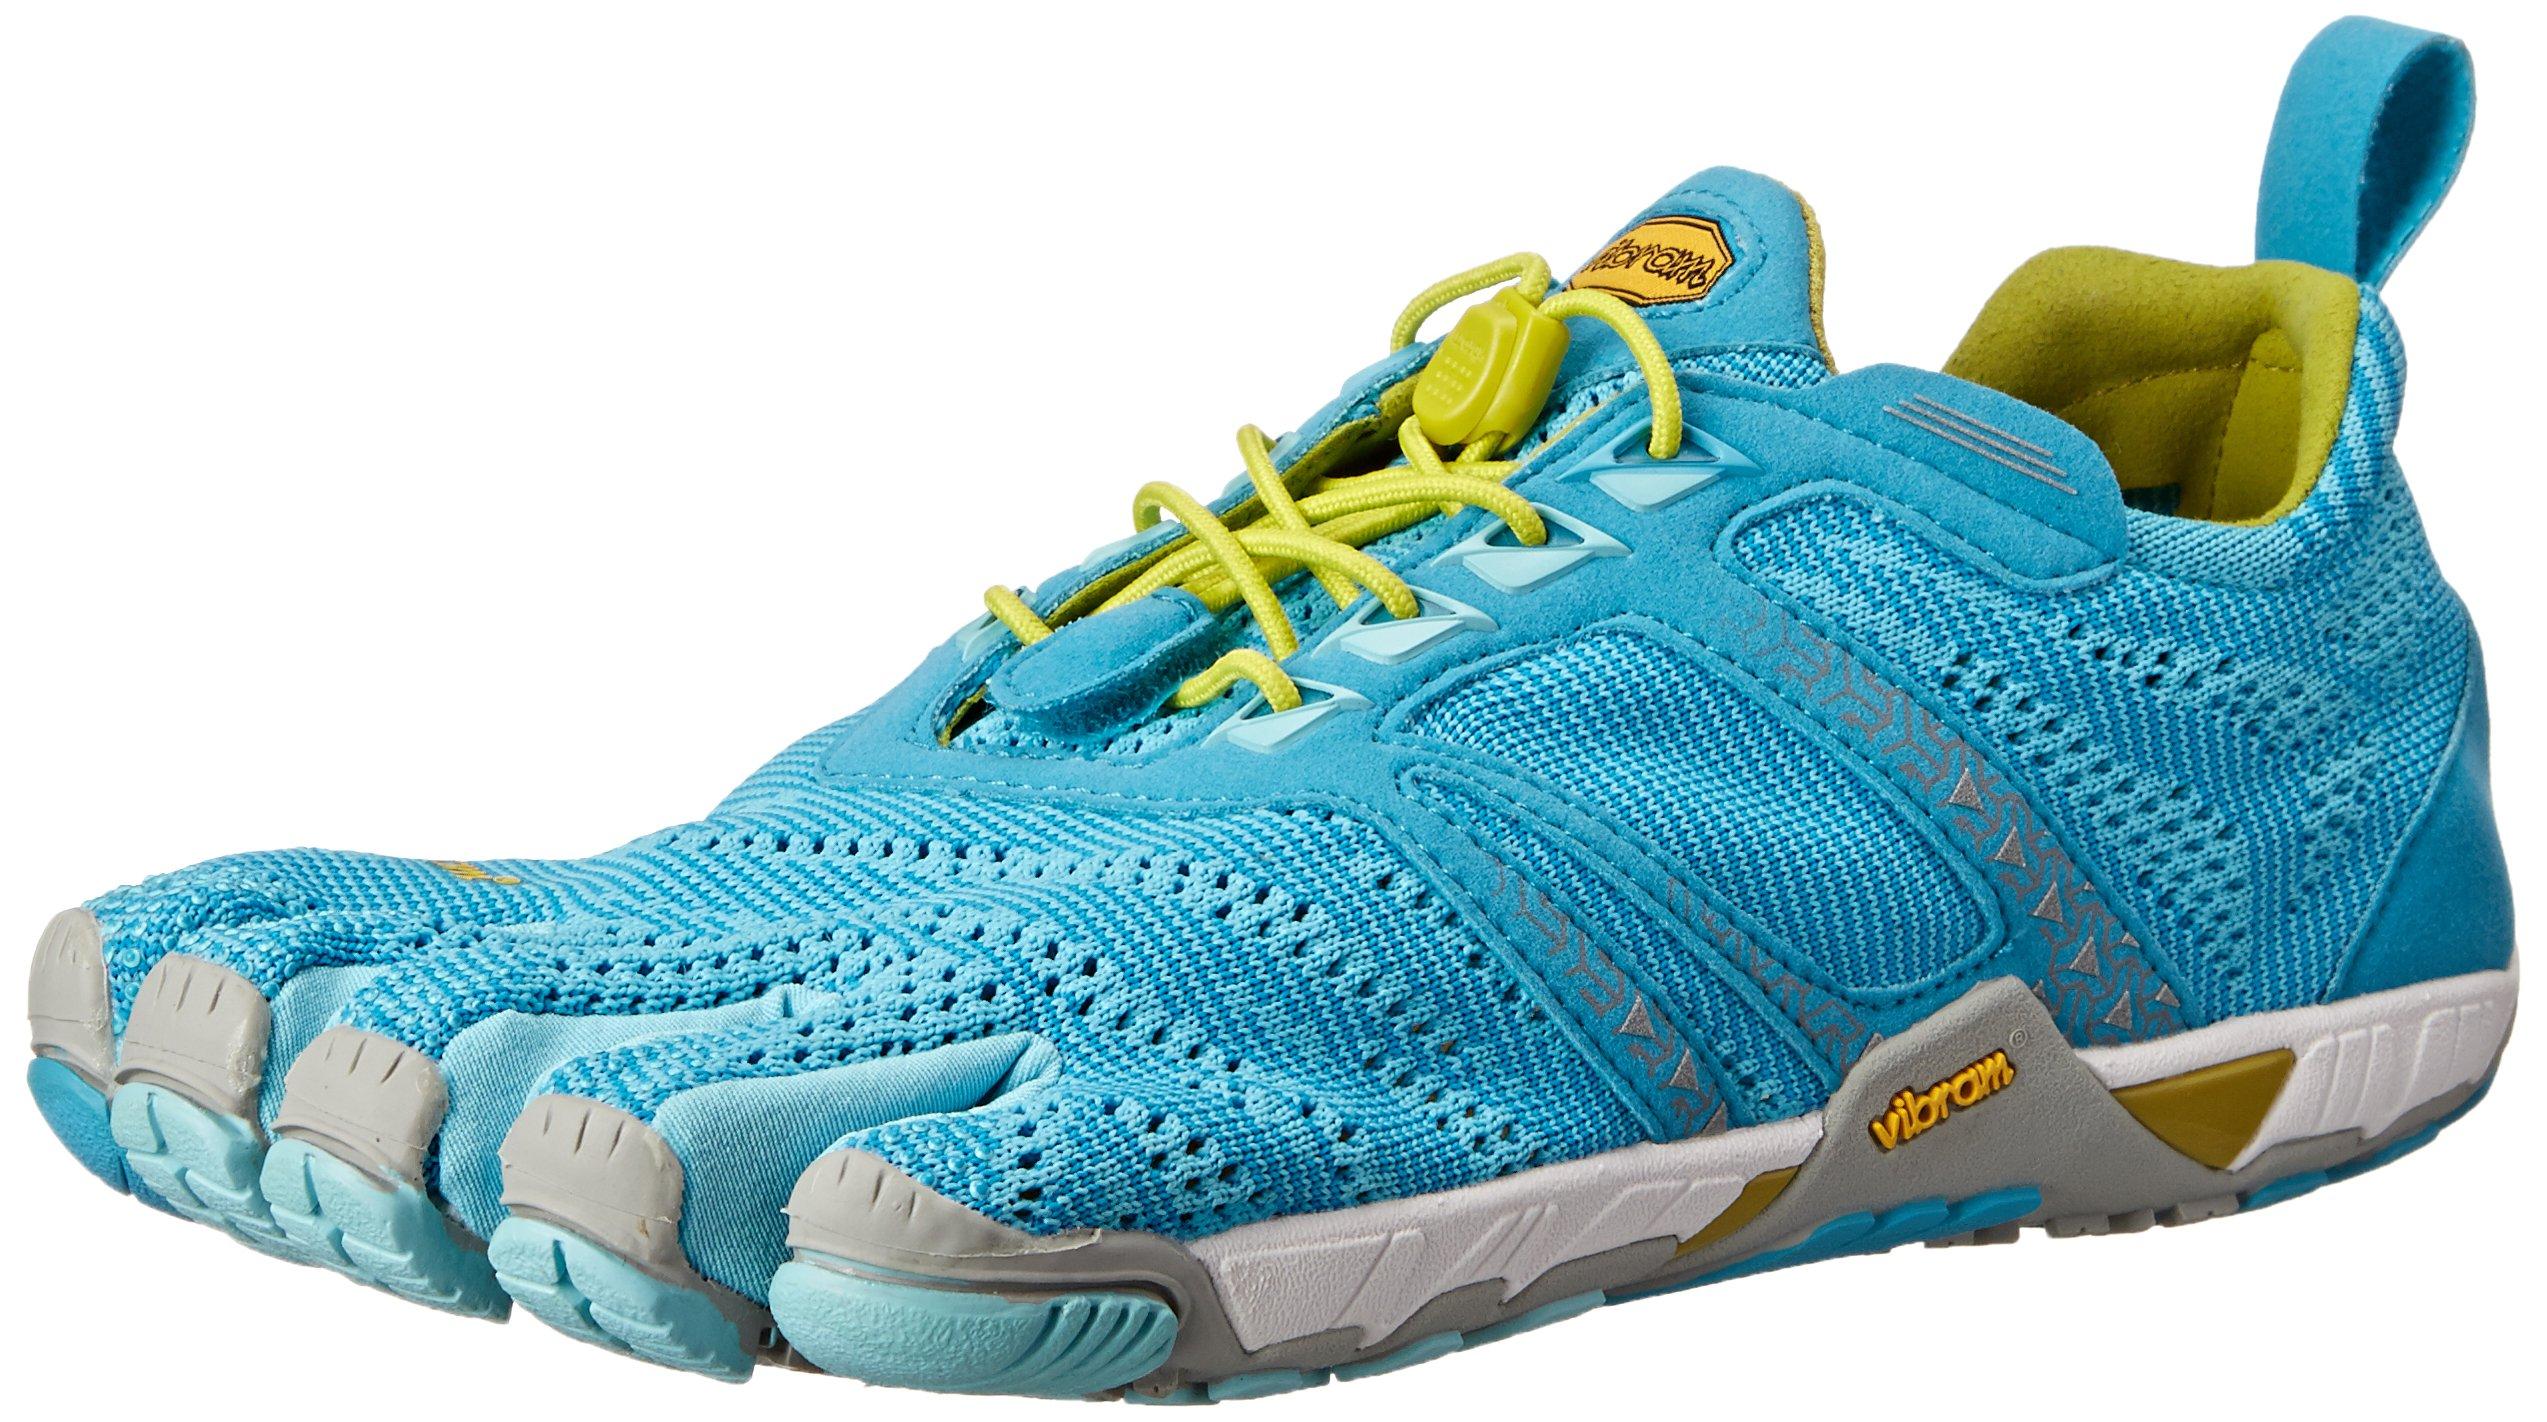 Vibram Women's KMD Evo Cross Training Shoe, Light Blue/Grey/Yellow, 41 EU/9-9.5 M US